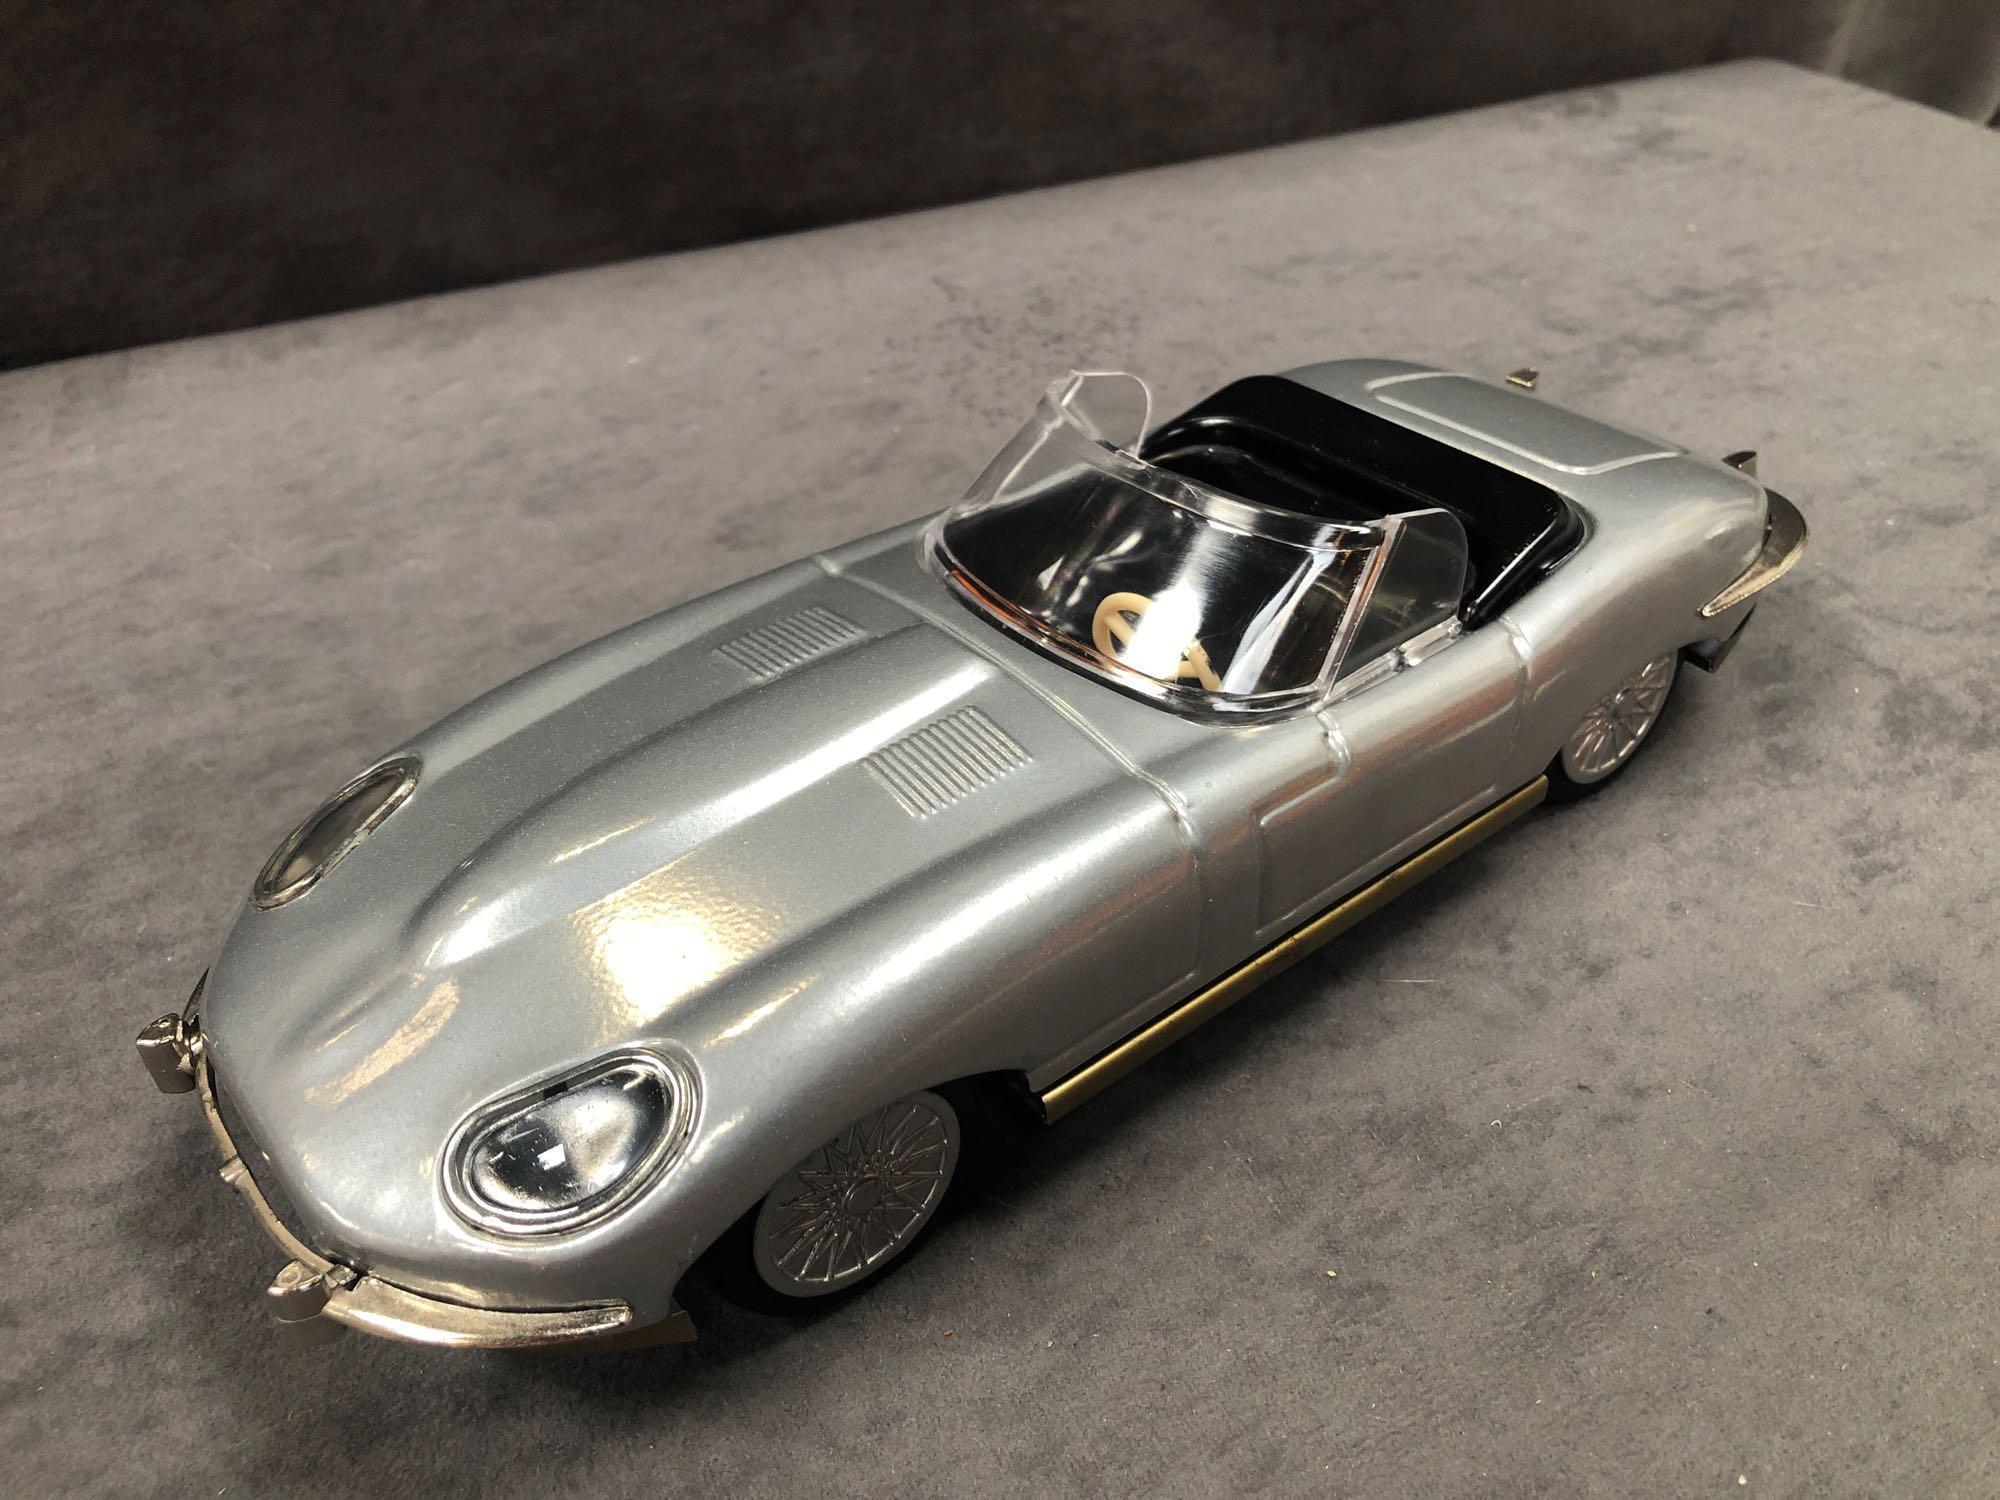 Lendulet Auto Push & Go Tinplate E Type Jaguar In Box - Image 2 of 2